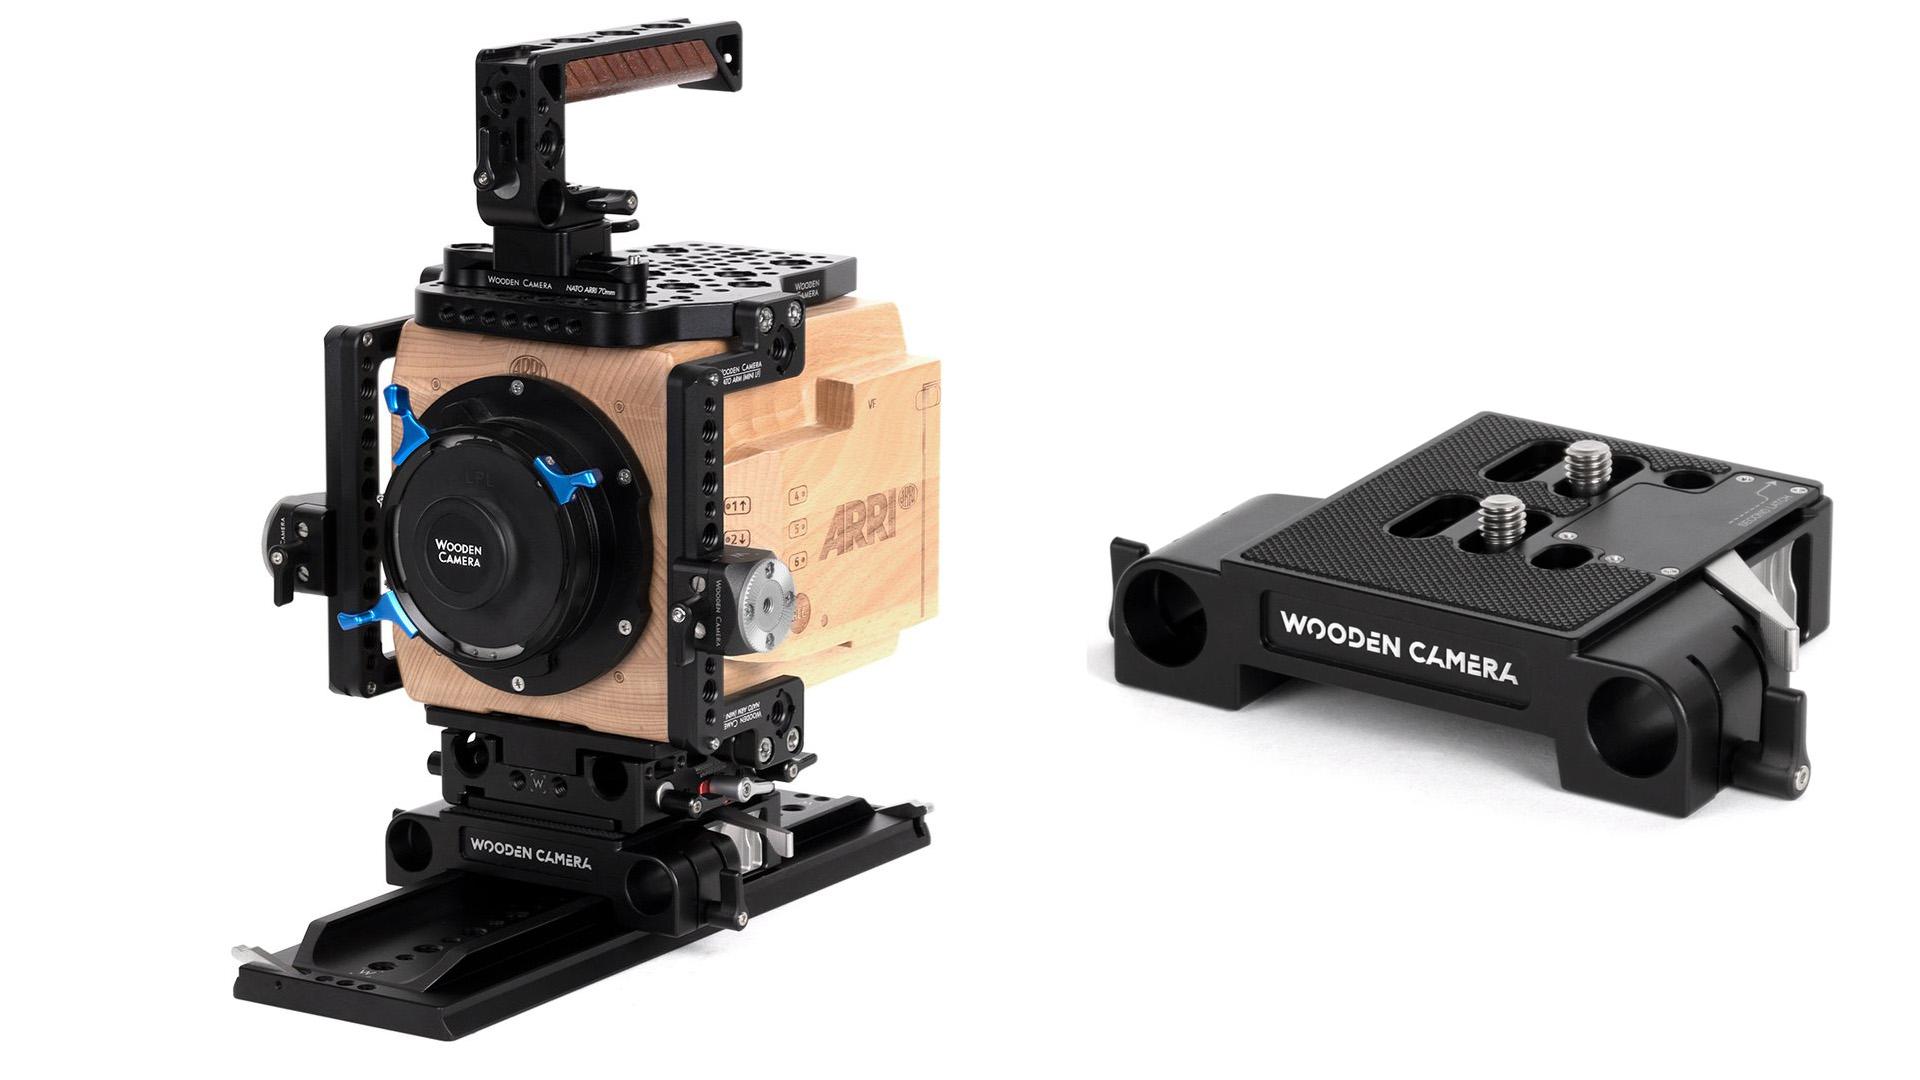 Wooden Cameraがクイックリリースブリッジプレートを発売